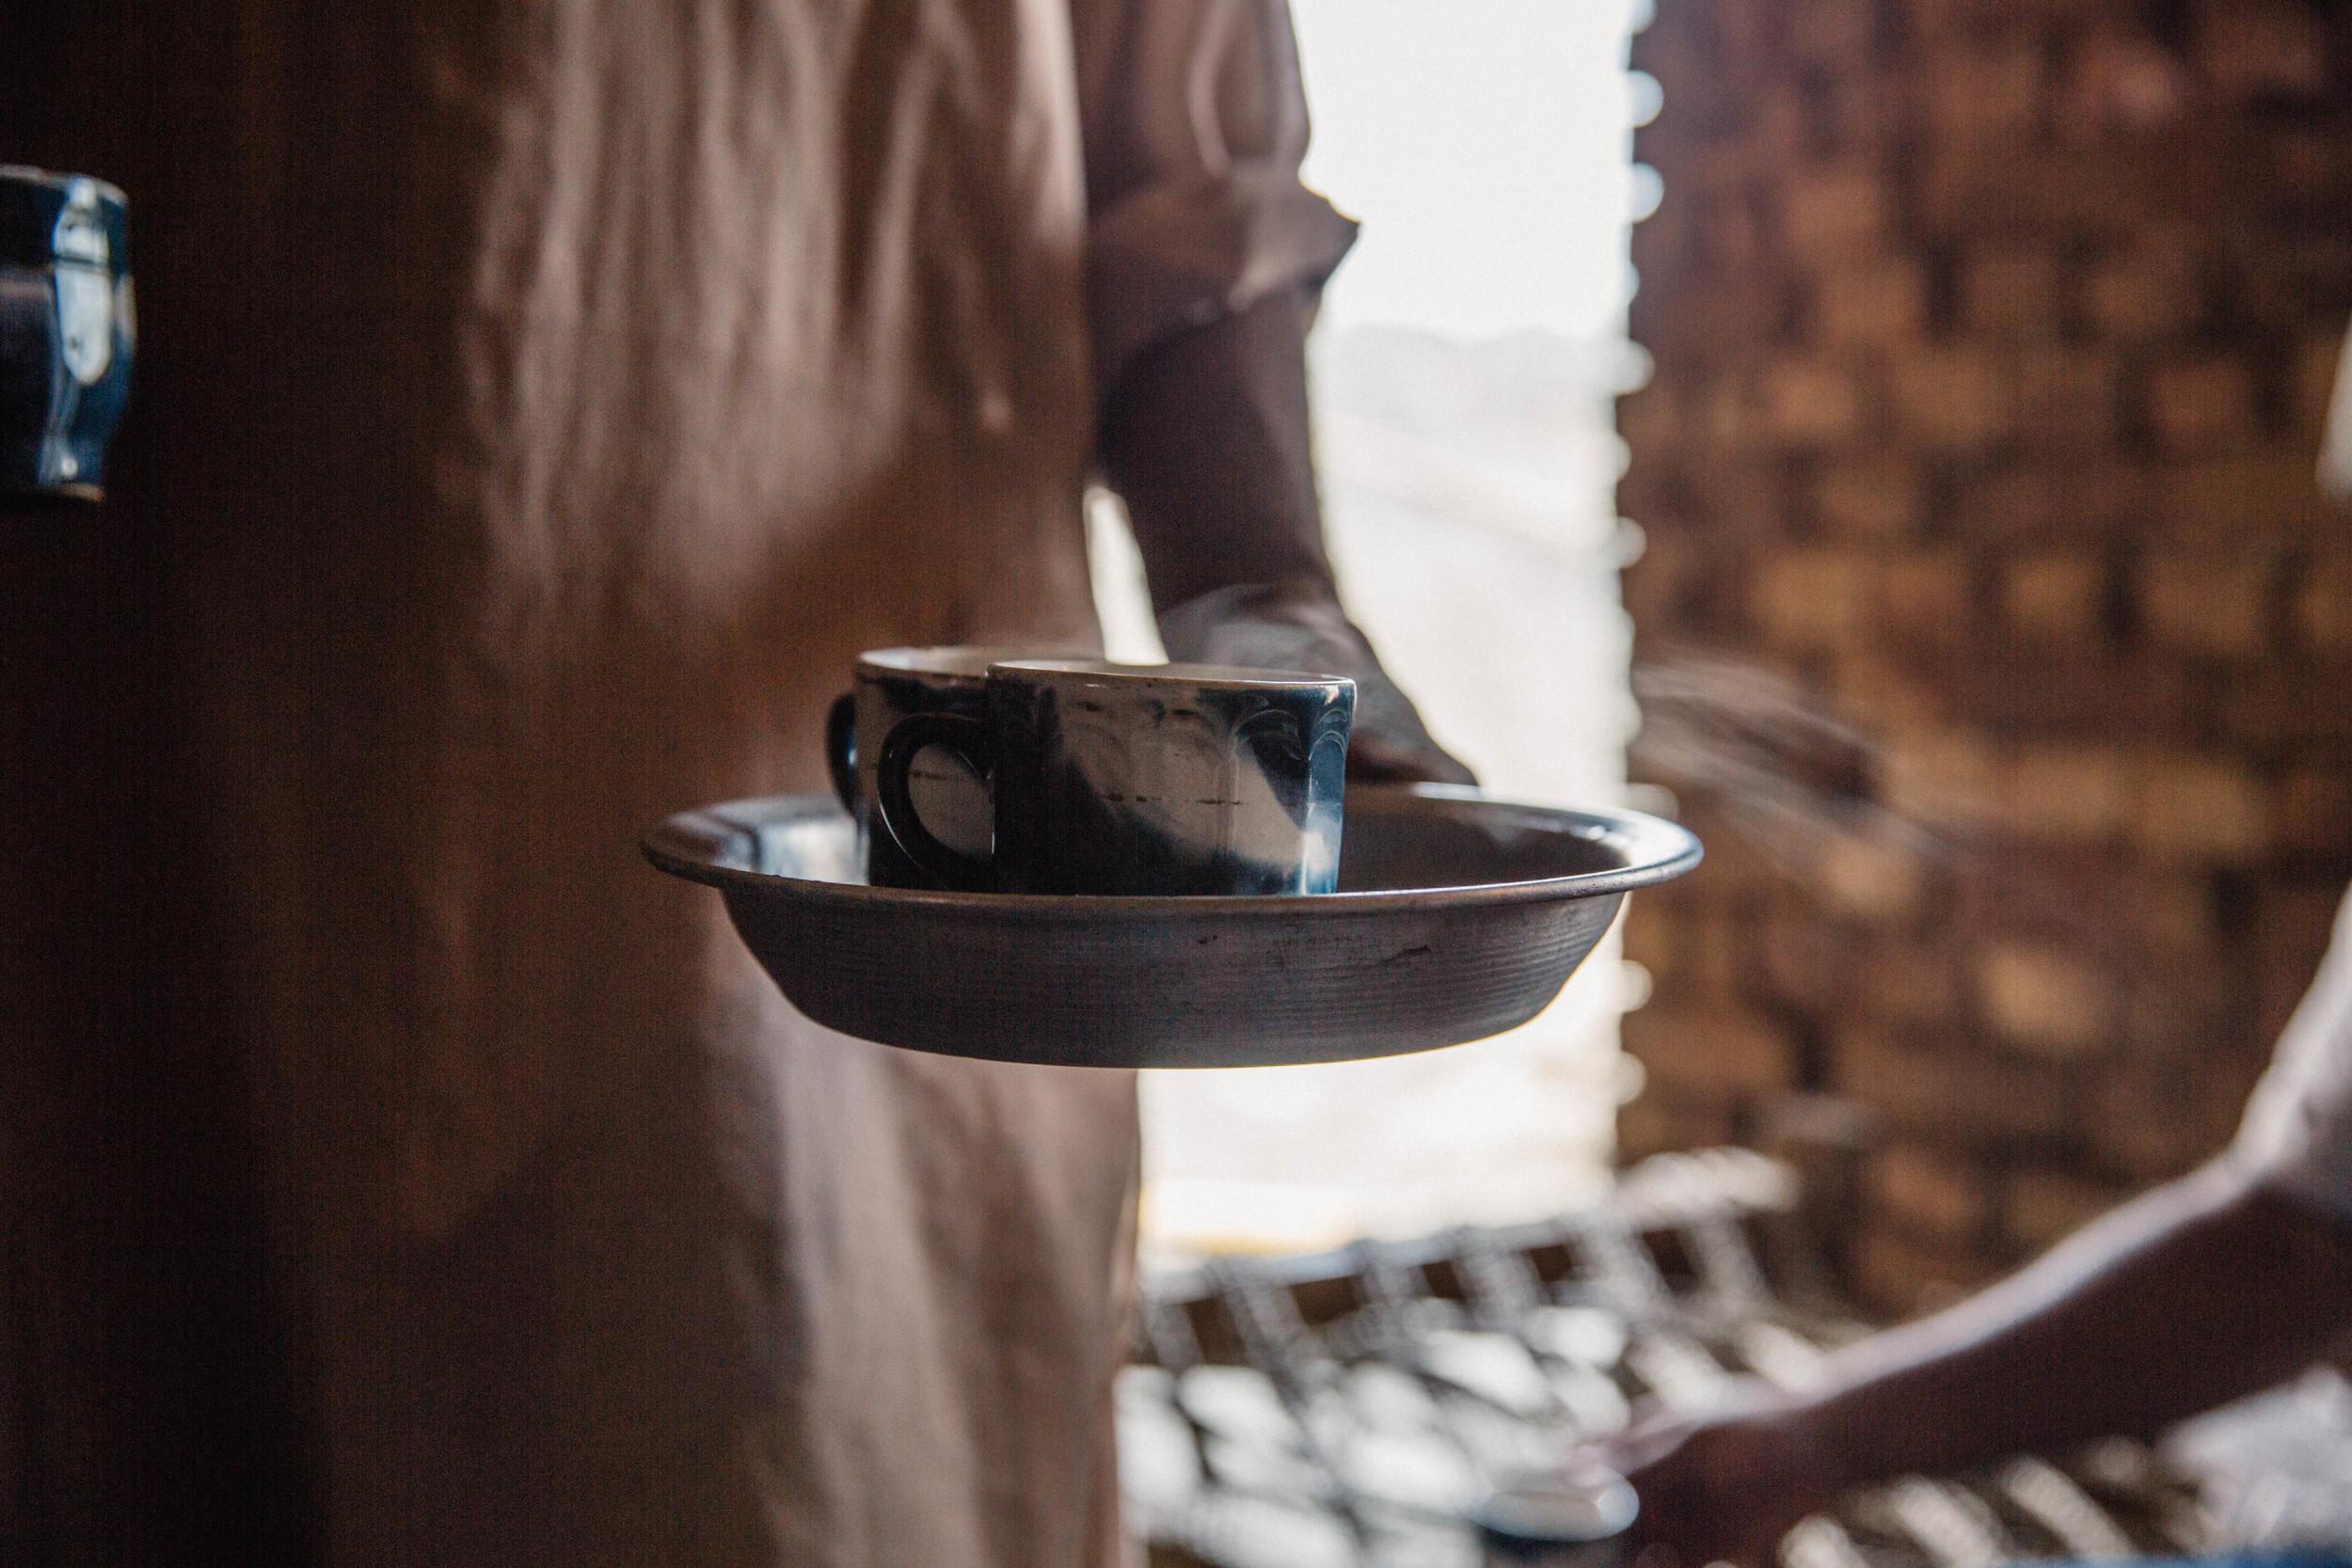 Working as a photographer overseas, Pakistan